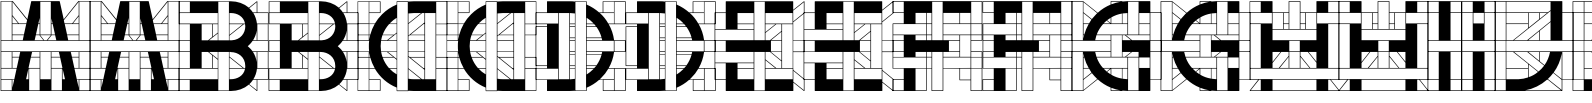 Enterline